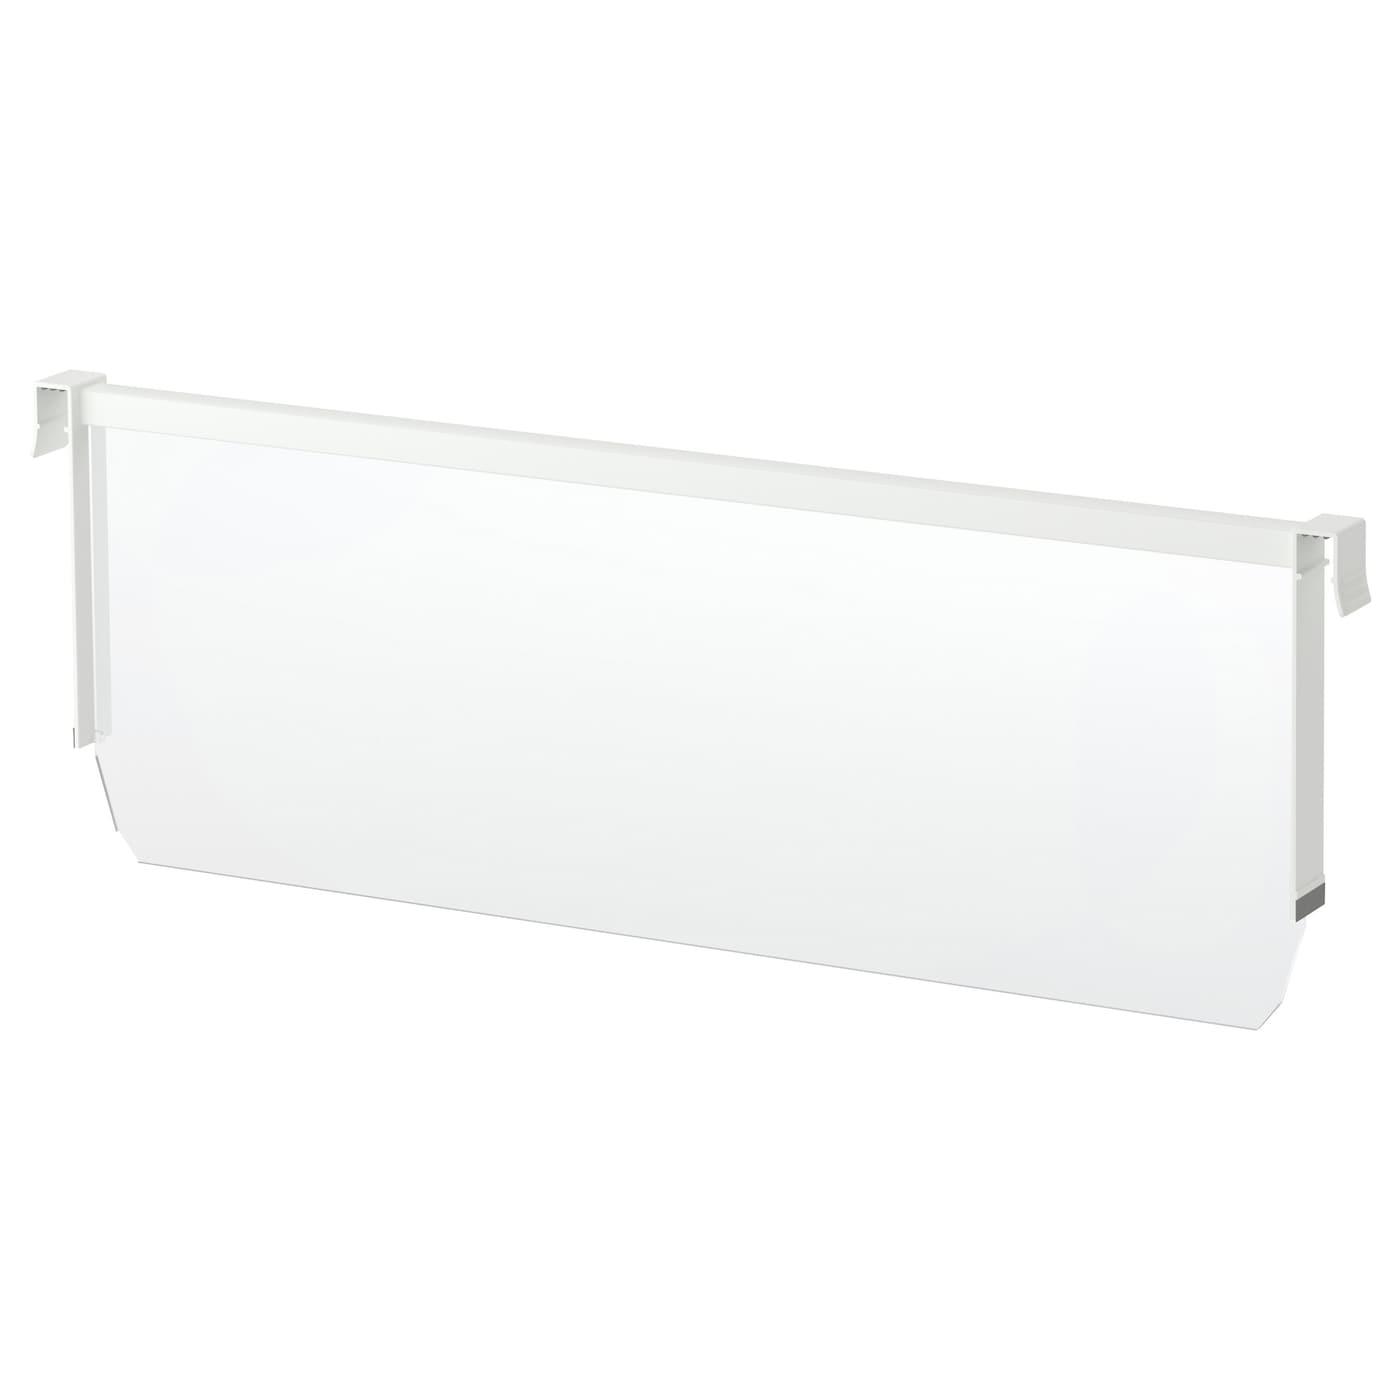 maximera tiroir haut blanc 80x37 cm ikea. Black Bedroom Furniture Sets. Home Design Ideas